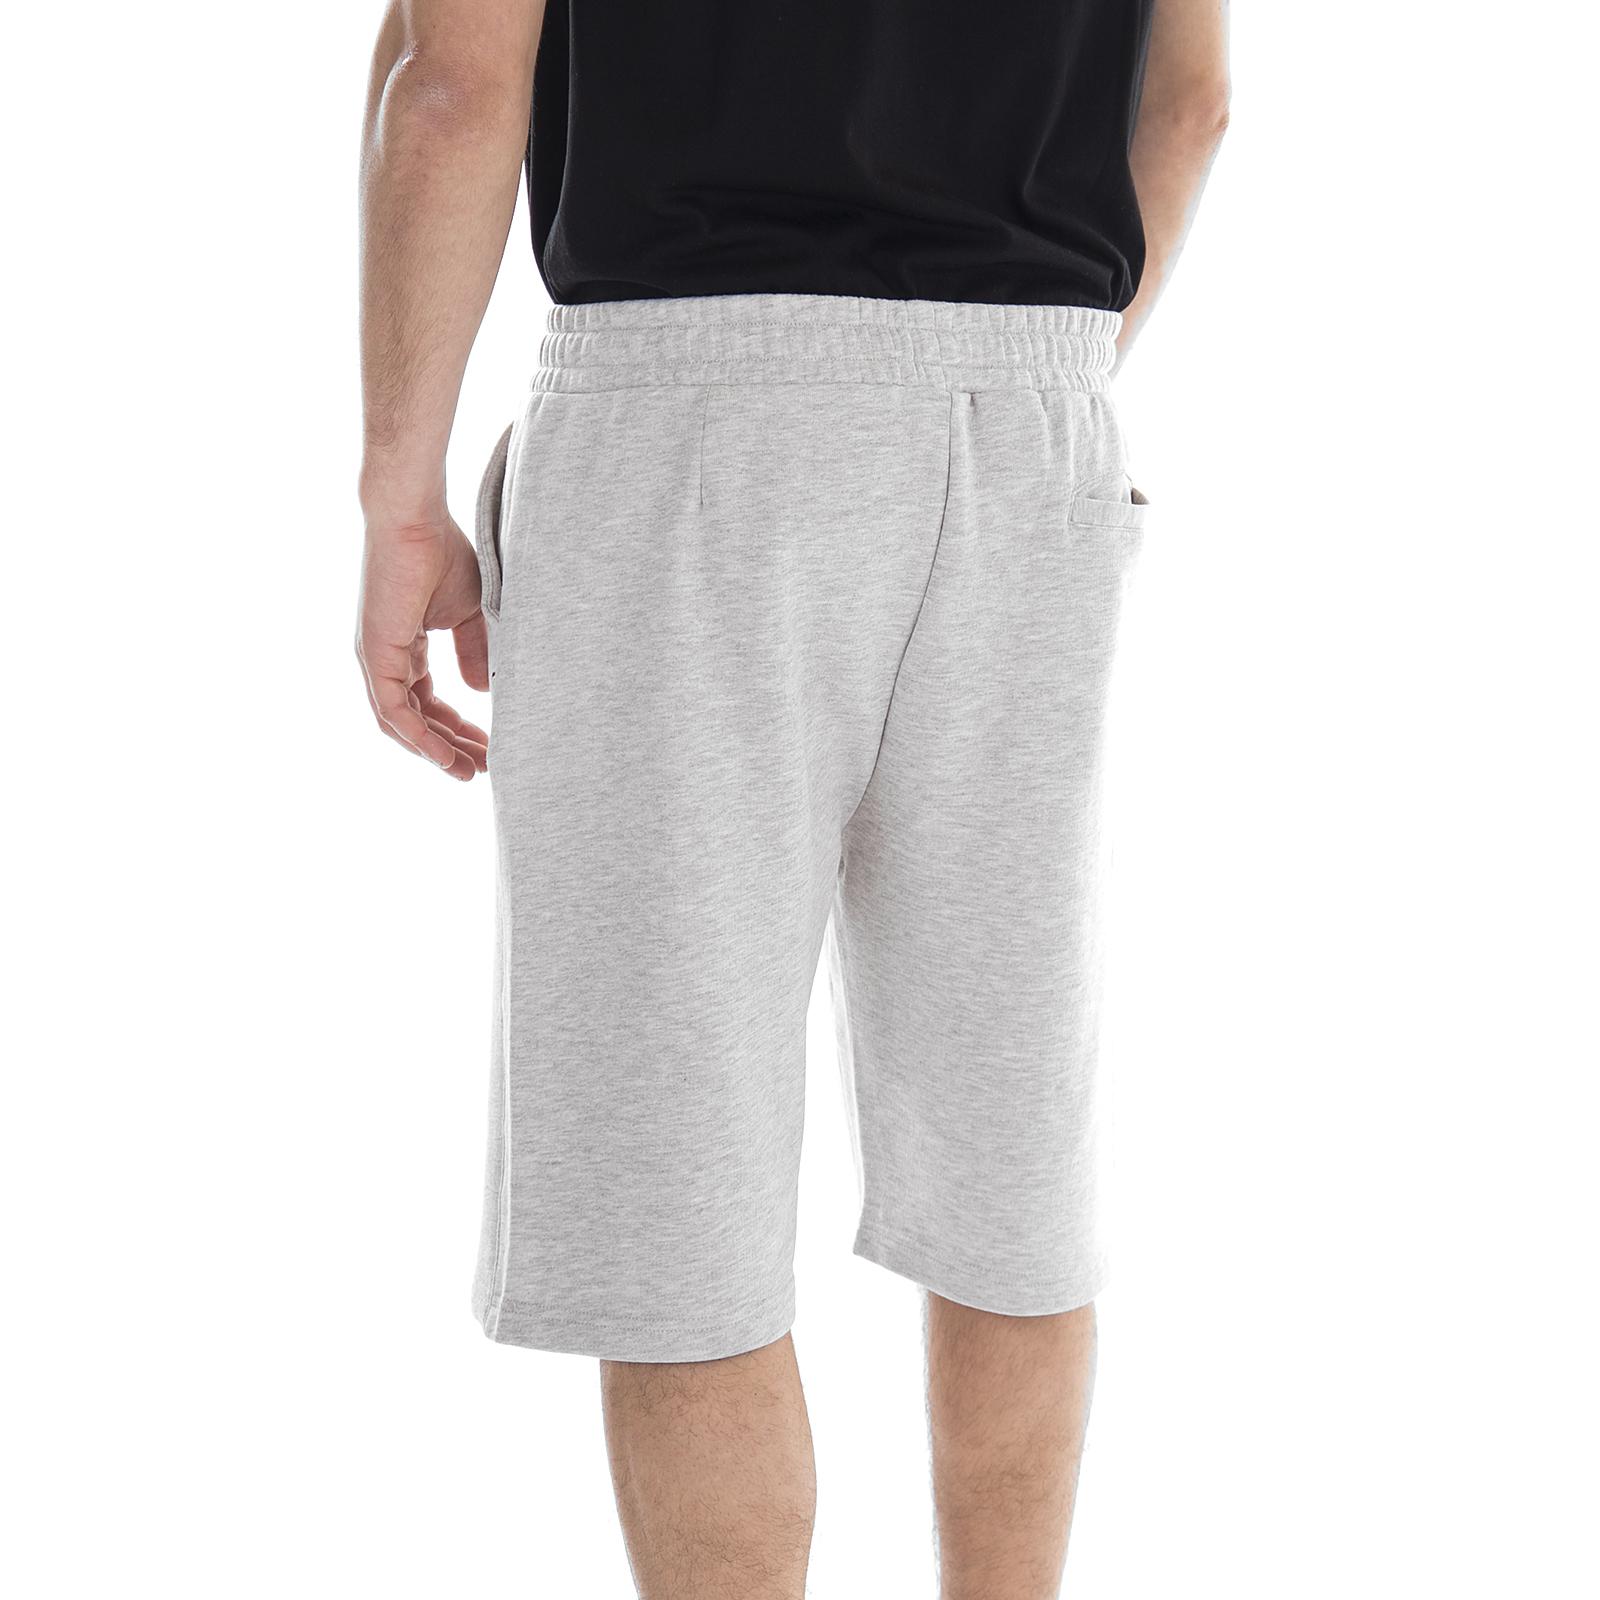 Bros Lichtgrijs Sweatshirts Shorts Cameron Sweat Melange Long Fila zTPqzw